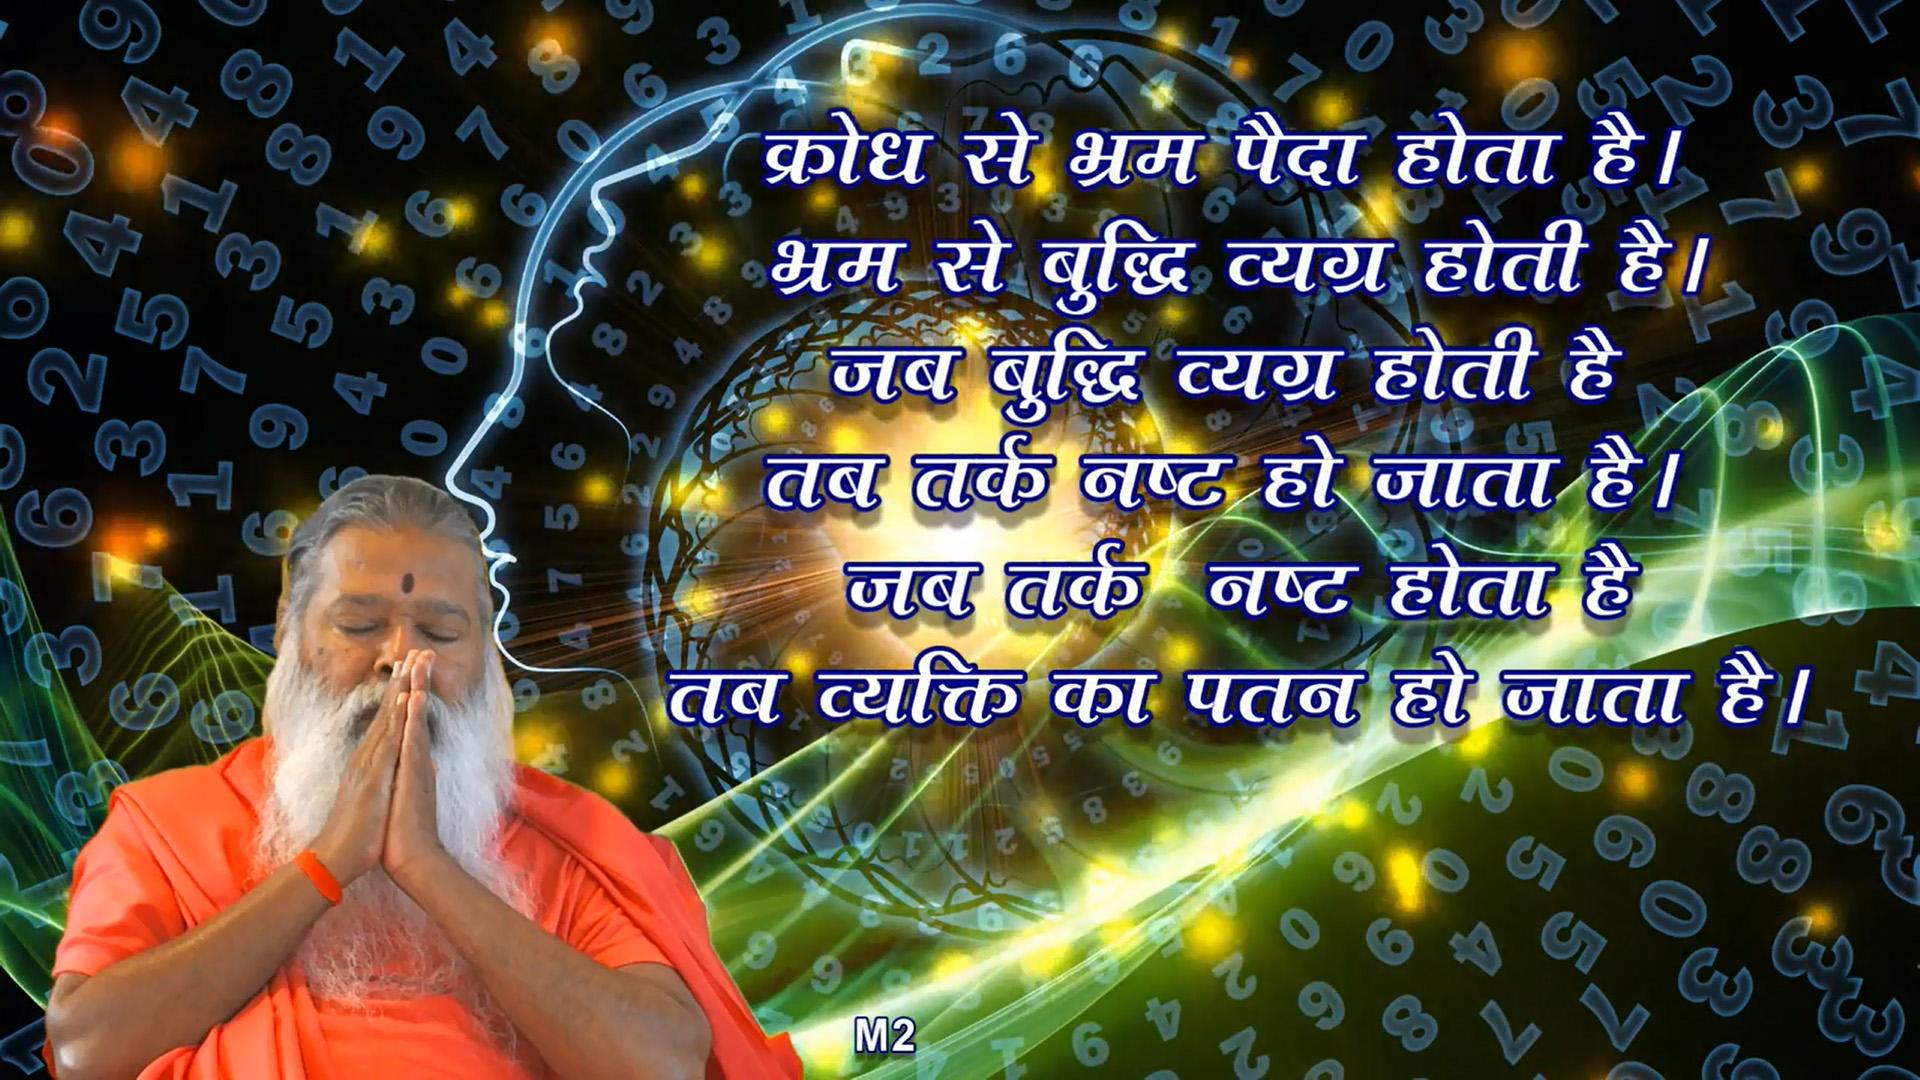 SgsMMS_Hindi_Dec0515